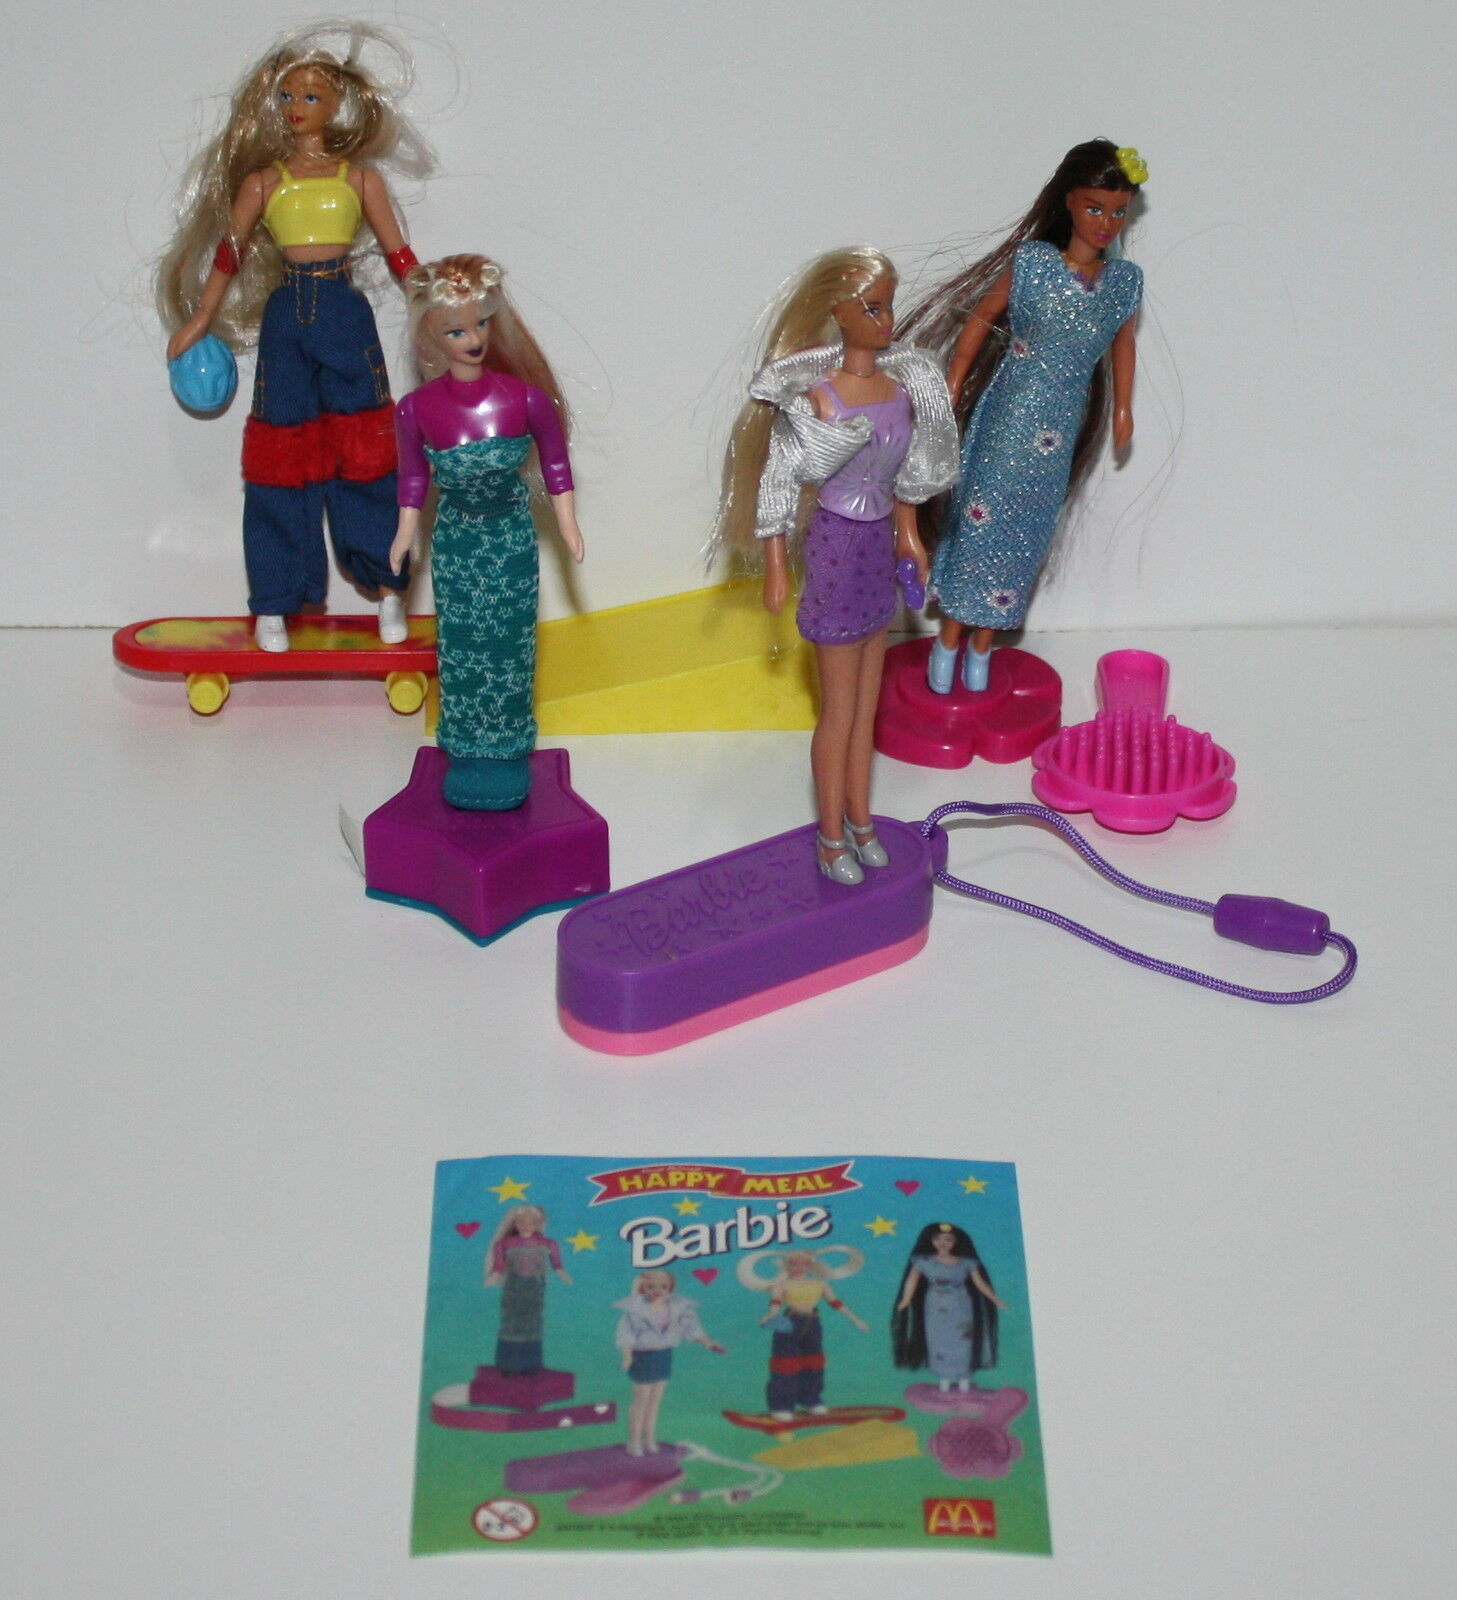 McDonald's MC DONALD'S HAPPY MEAL - 2000 Barbie Serie completa